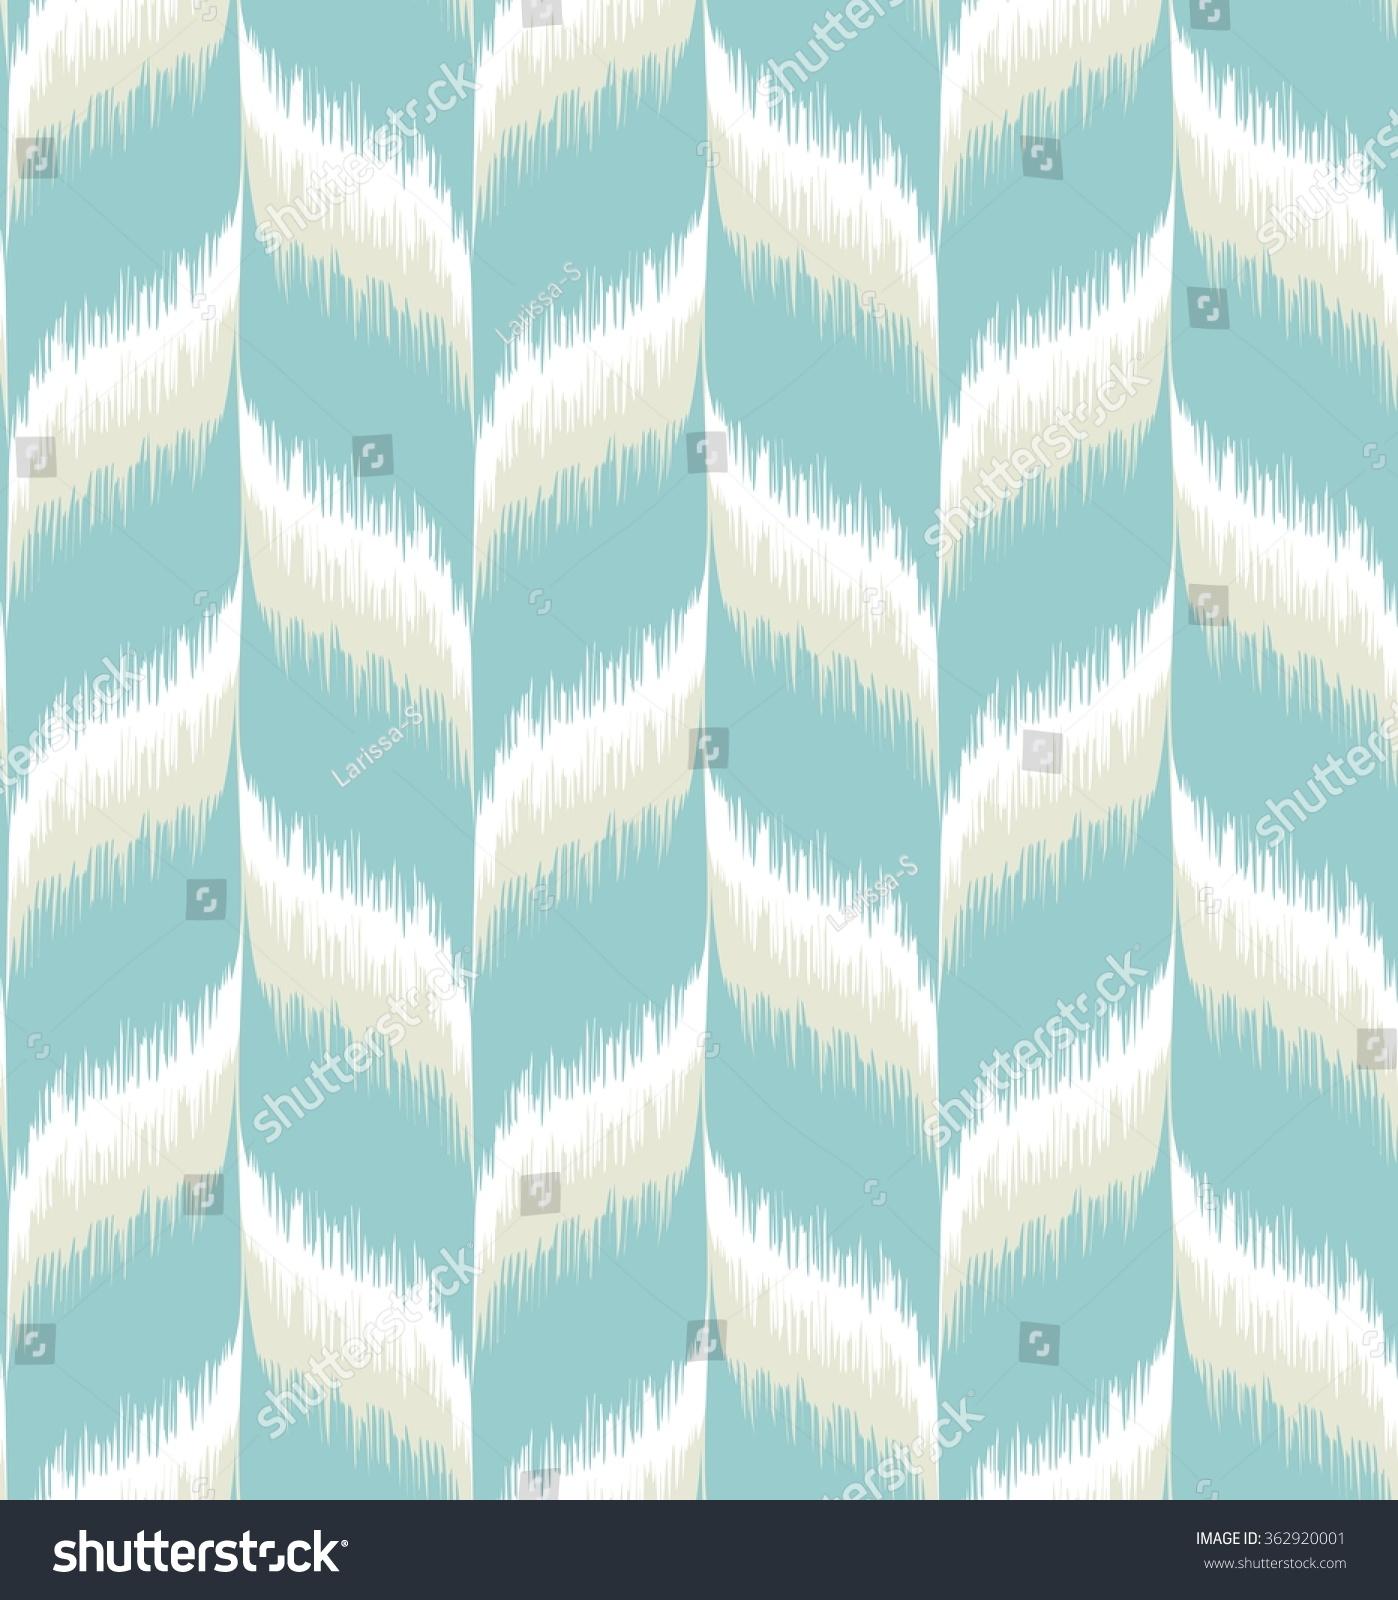 Awesome Light Blue Chevron Fabric Contemporary - Bathtub for ...